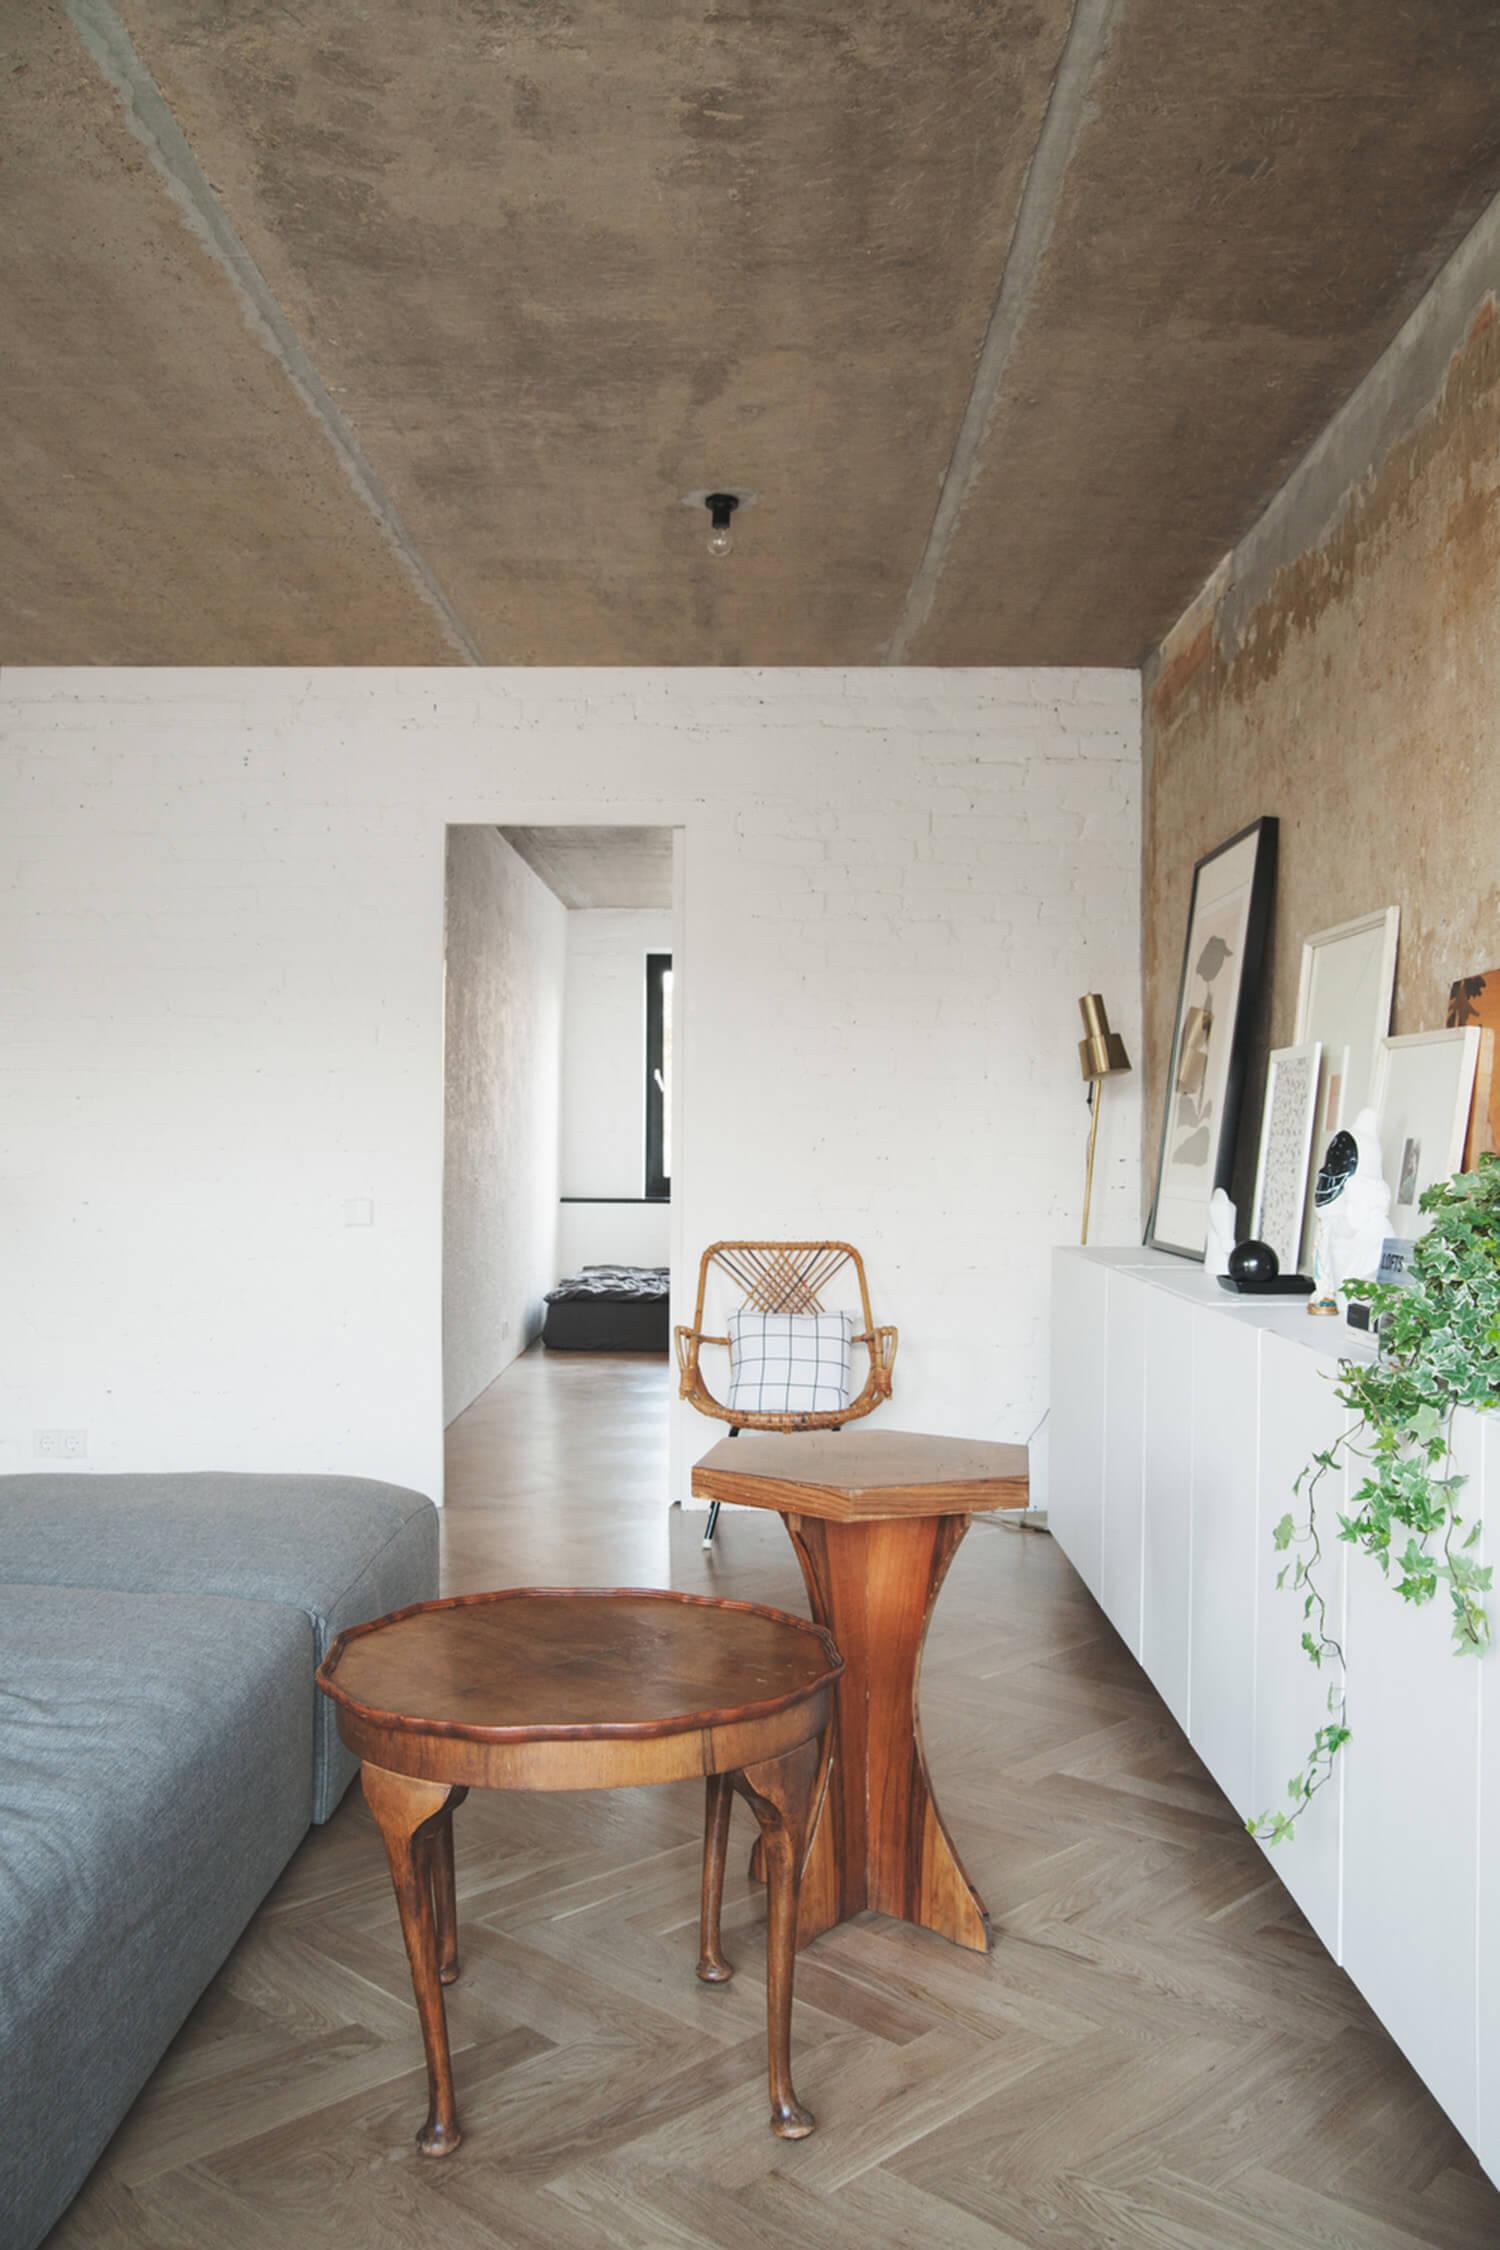 est living concrete ceiling apartment crosby studios.05